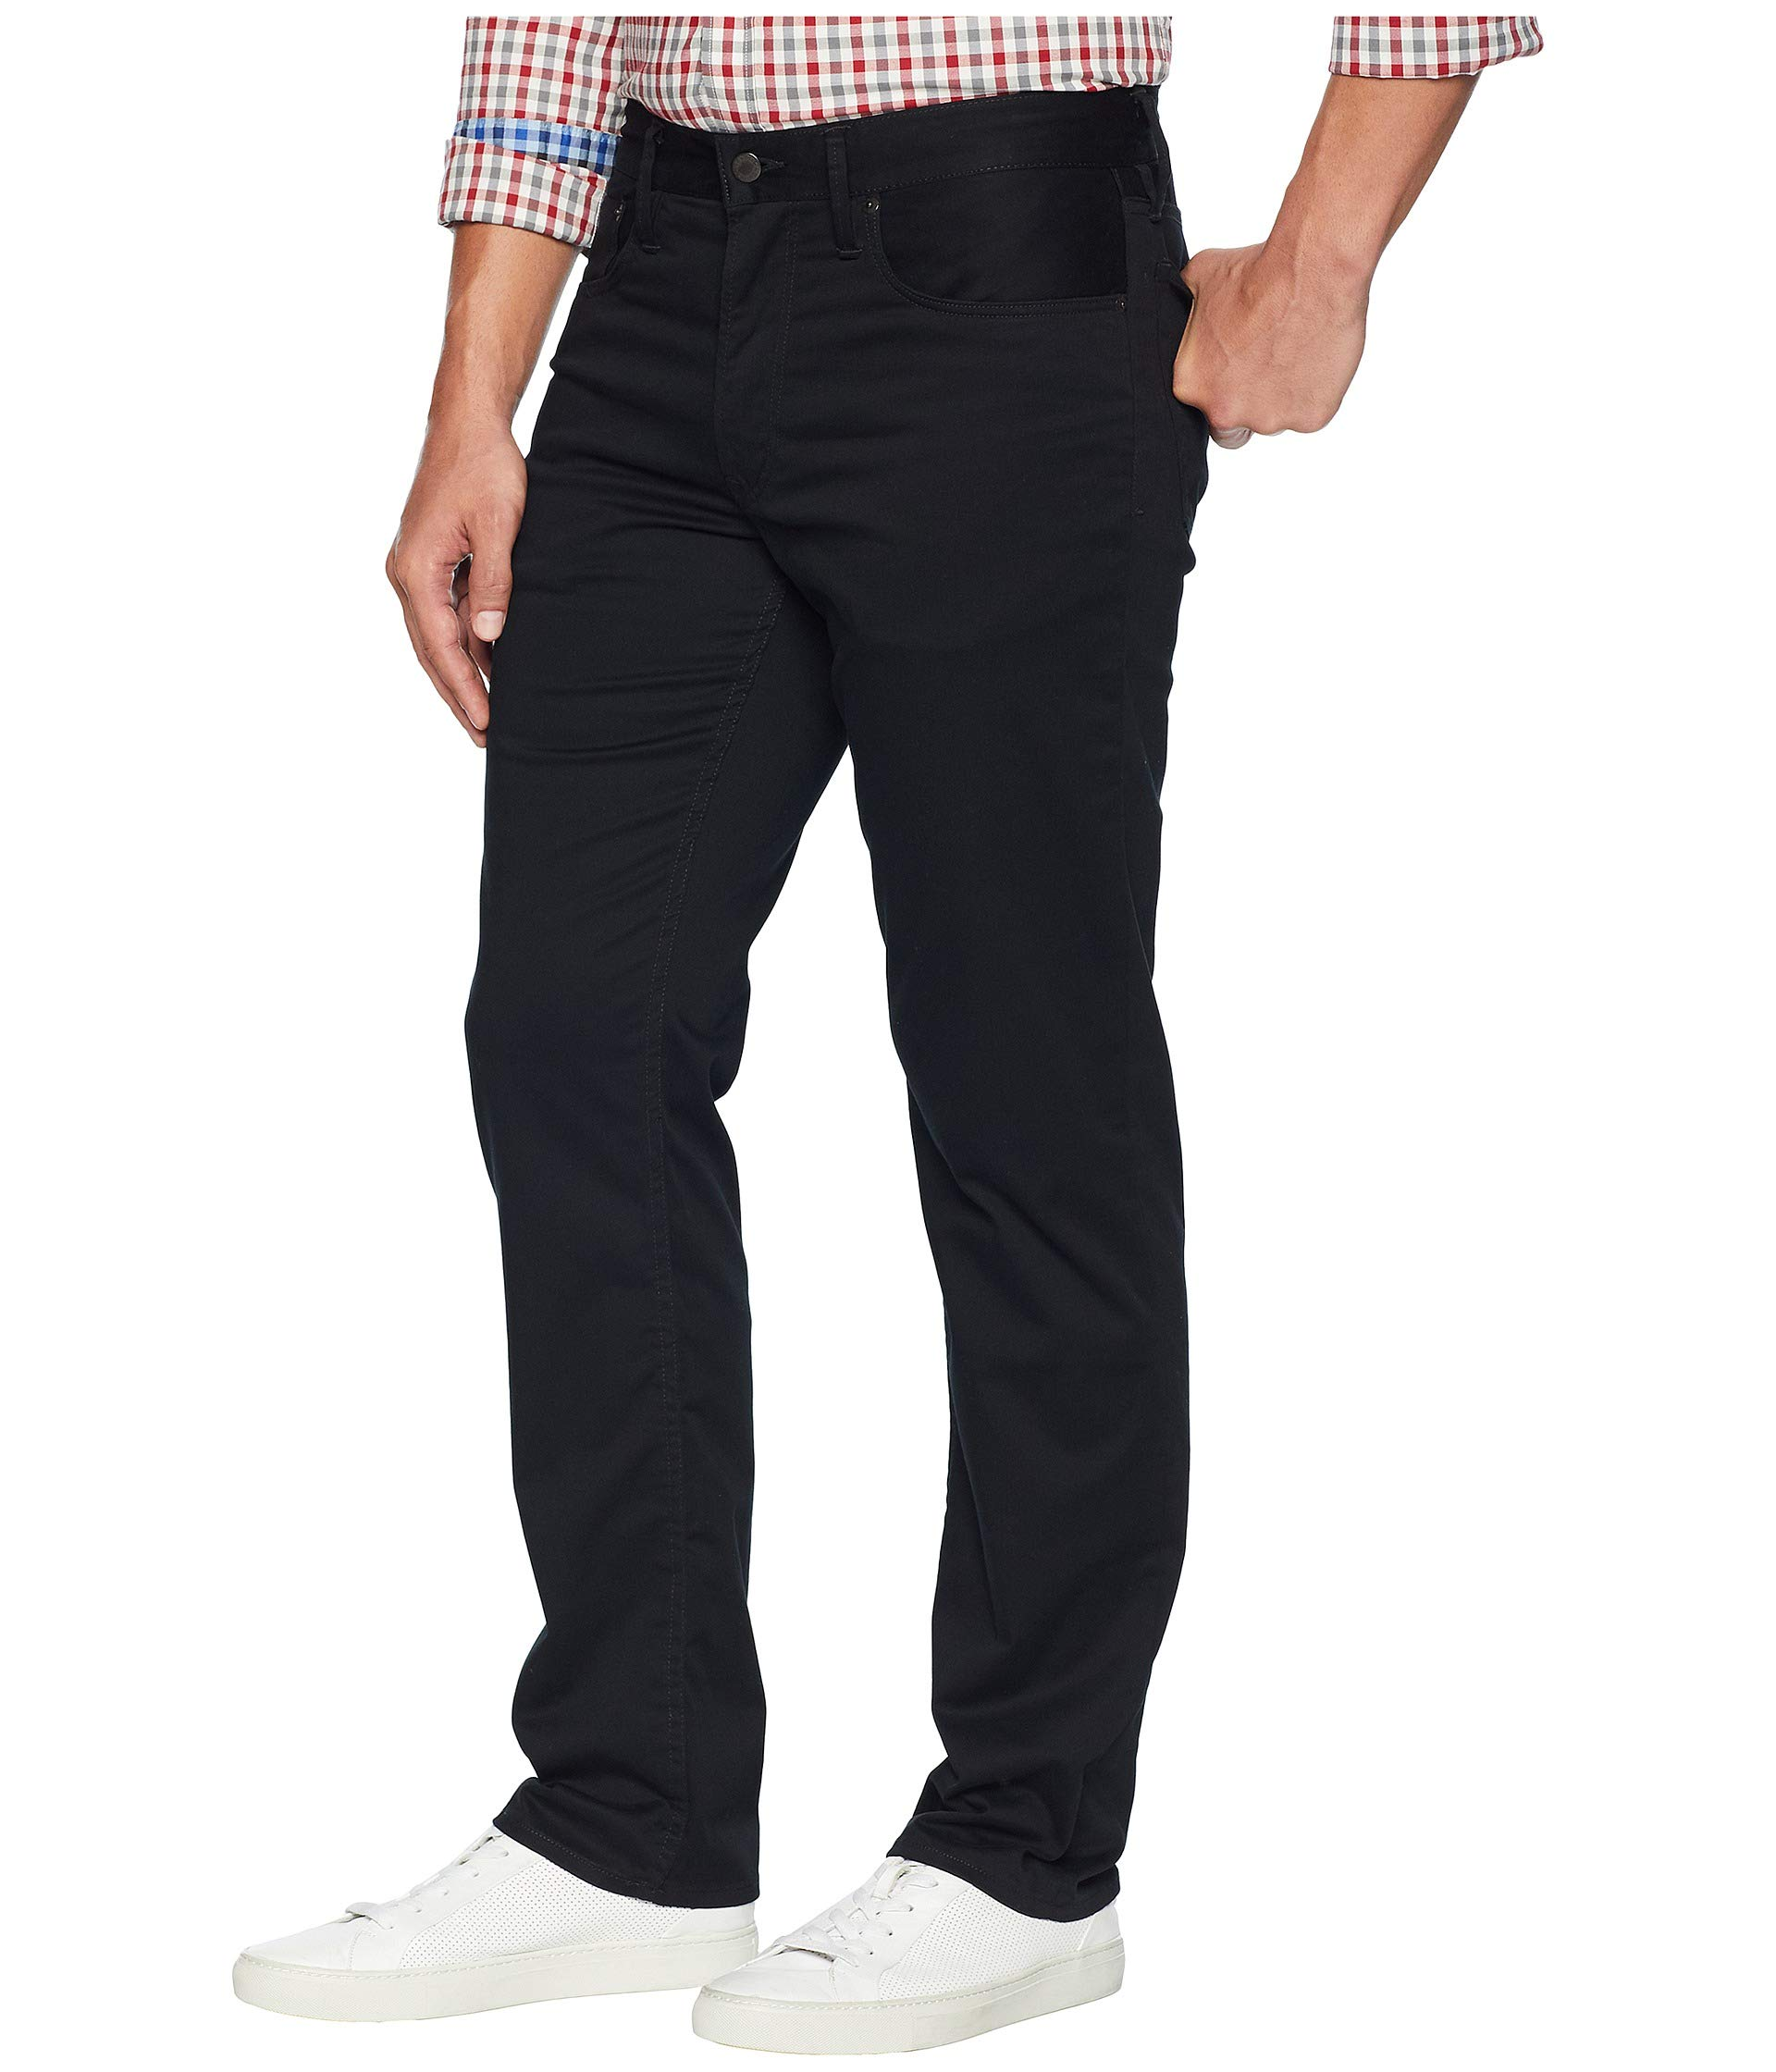 Pants Ralph Polo Lauren Sateen Black Stretch Cotton Prospect 8BSnB6